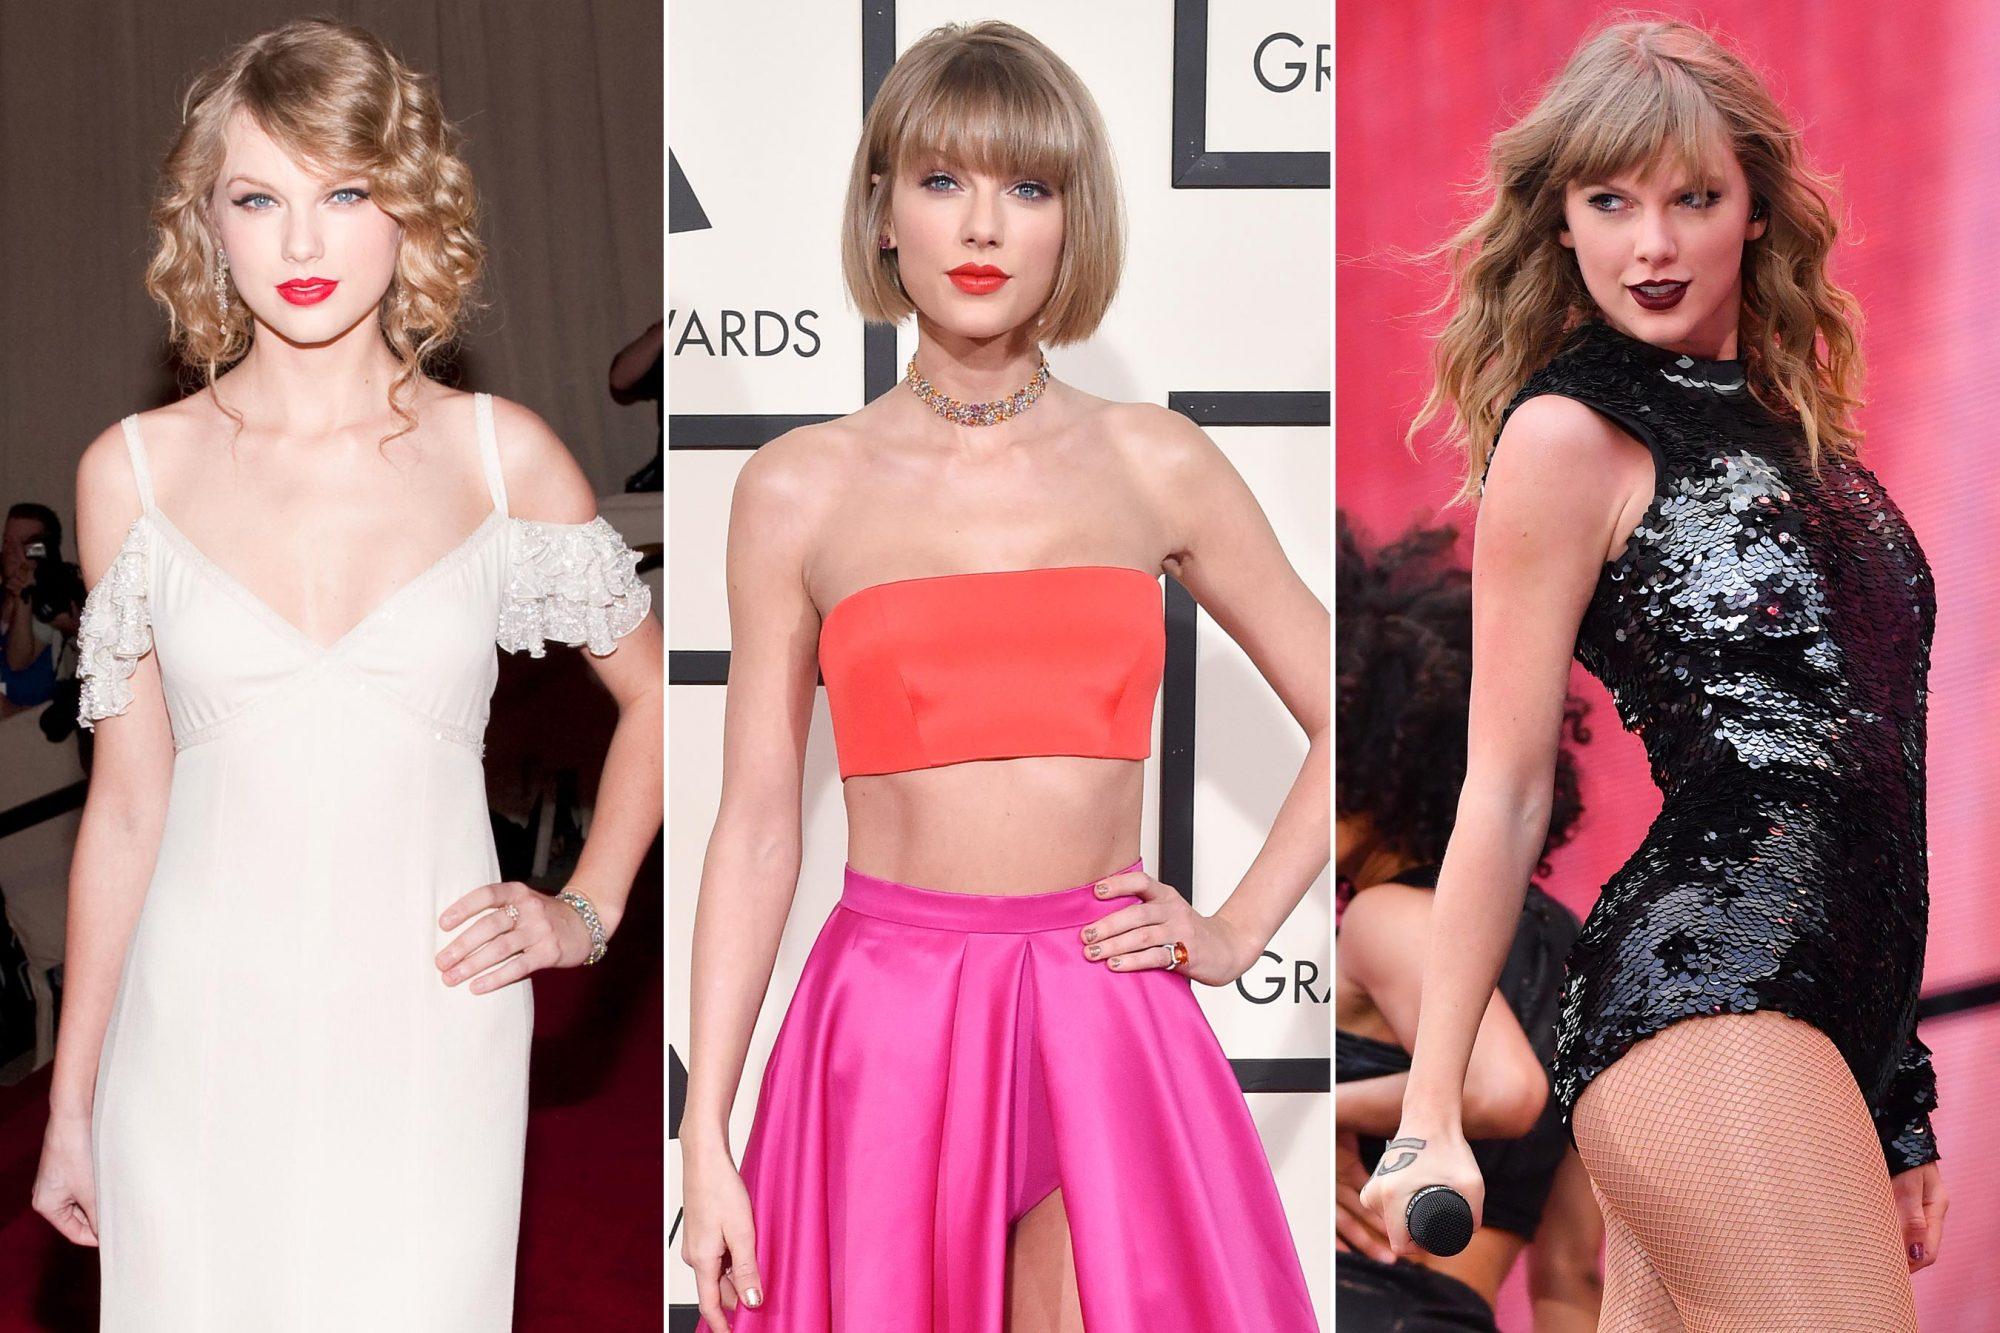 Taylor Swift Style Lover Reputation 1989 Fashion Ew Com